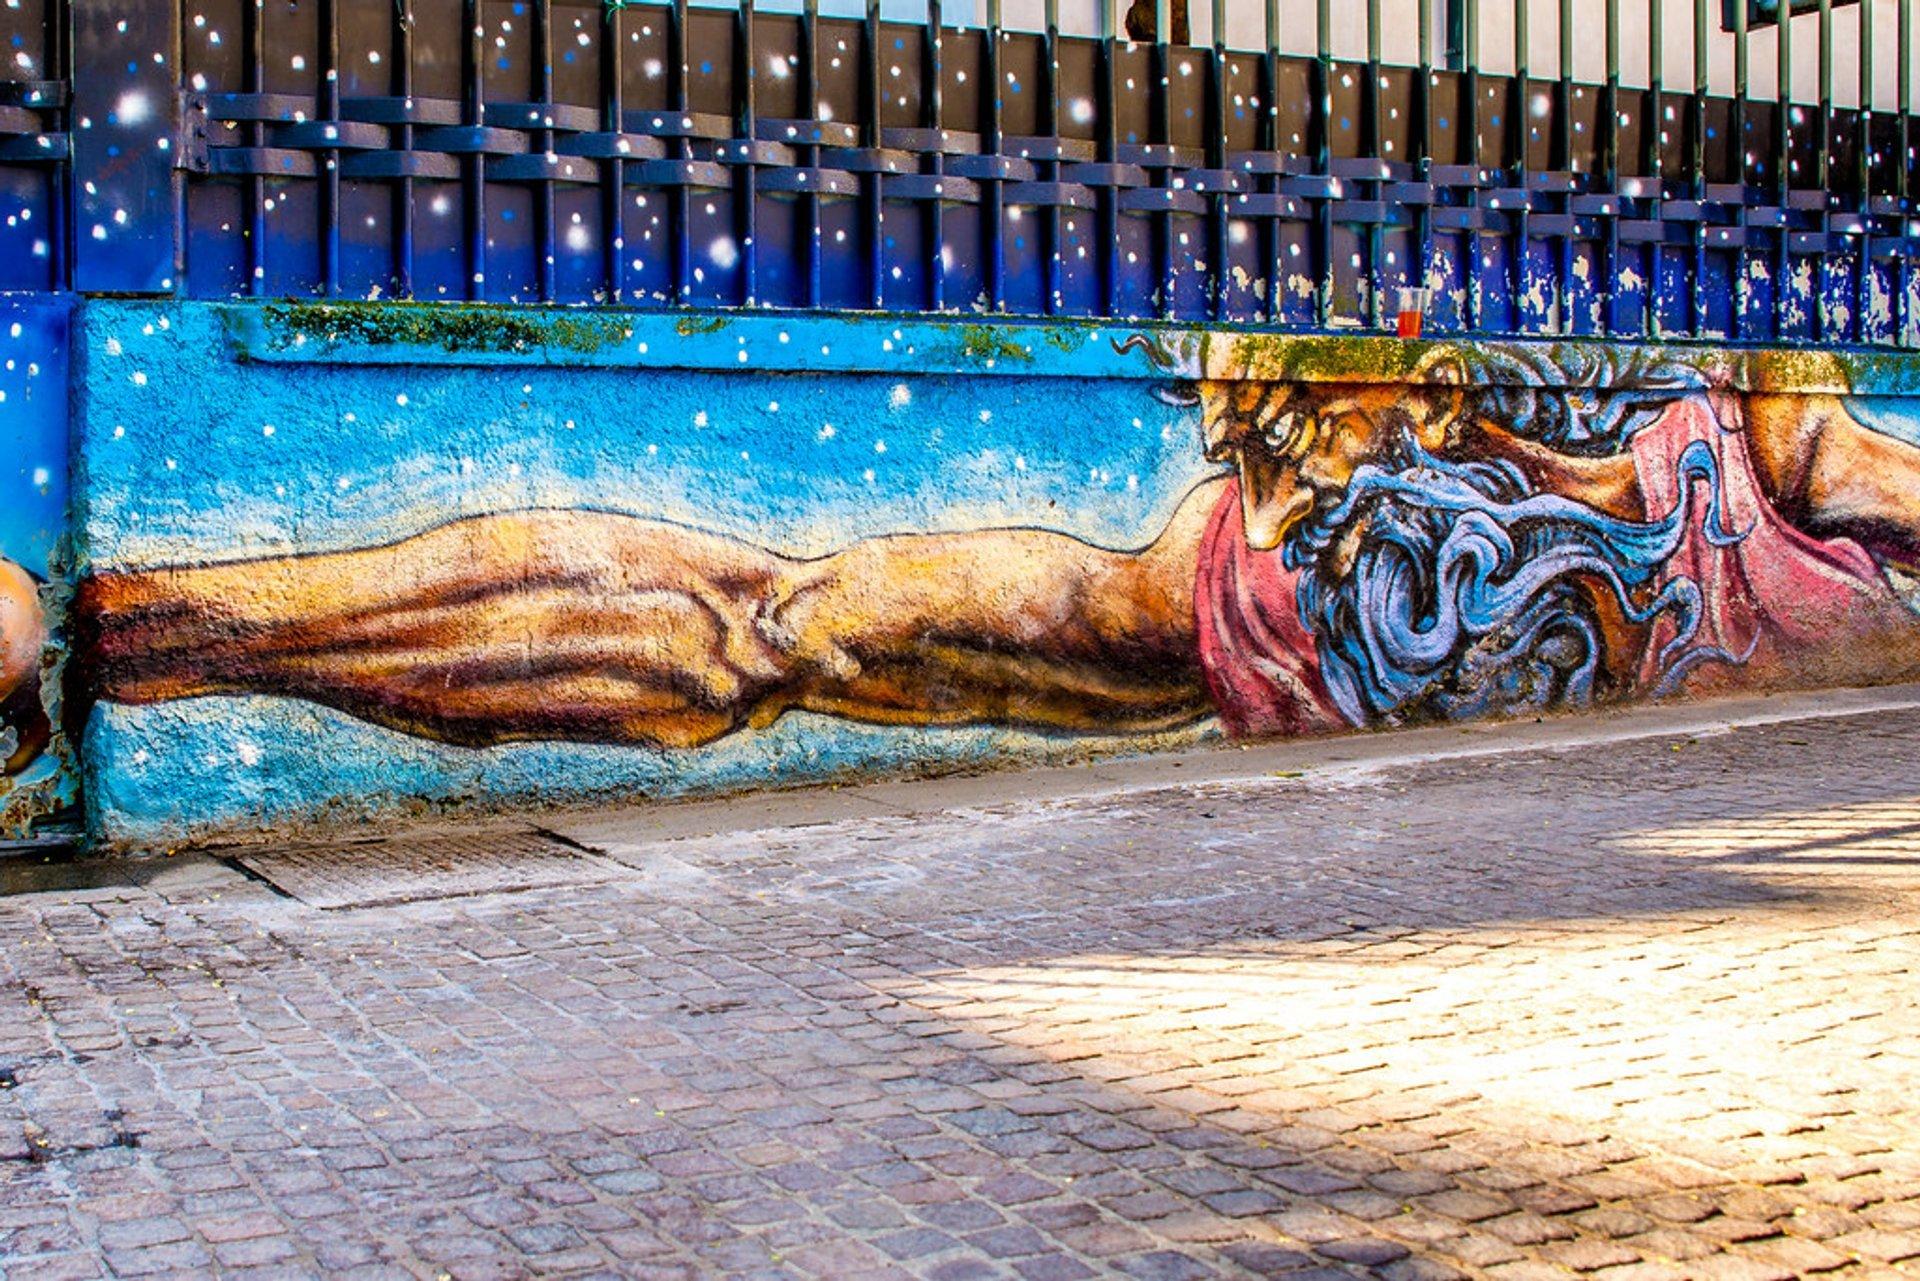 Best time for Isola Street Art in Milan 2020